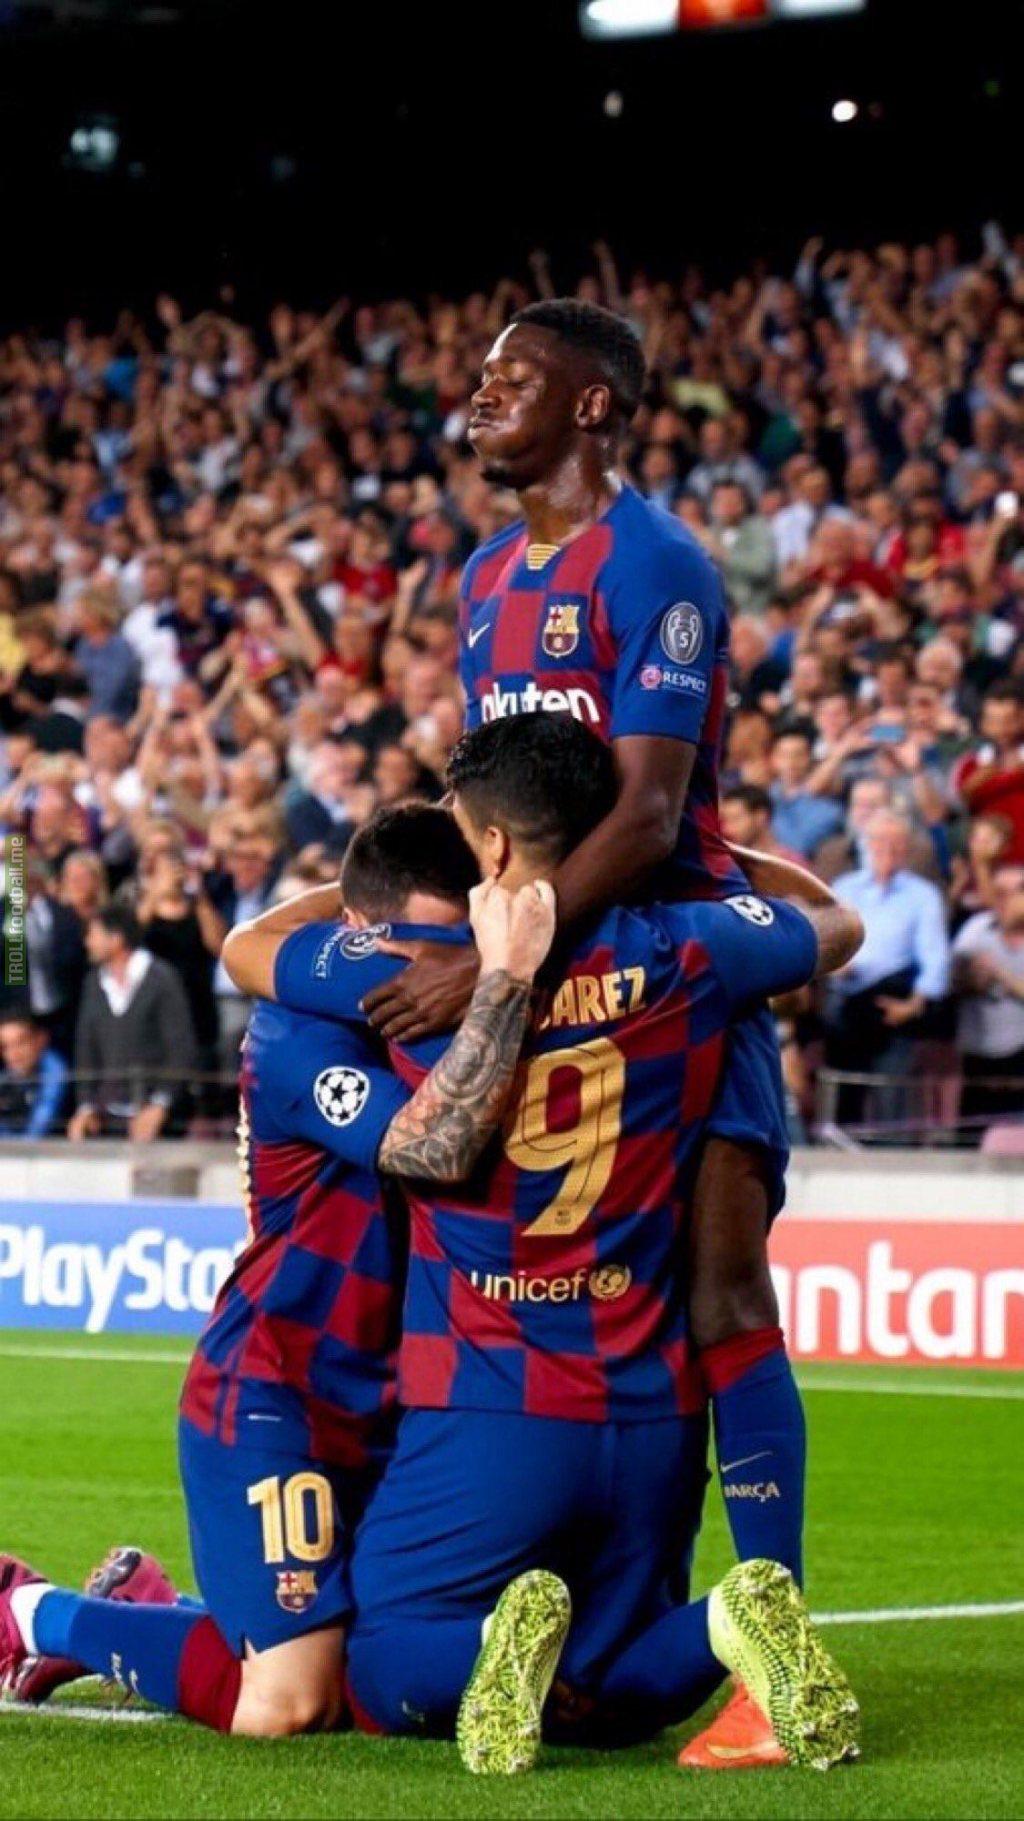 Messi, Suárez and Dembélé celebrating the winning goal.